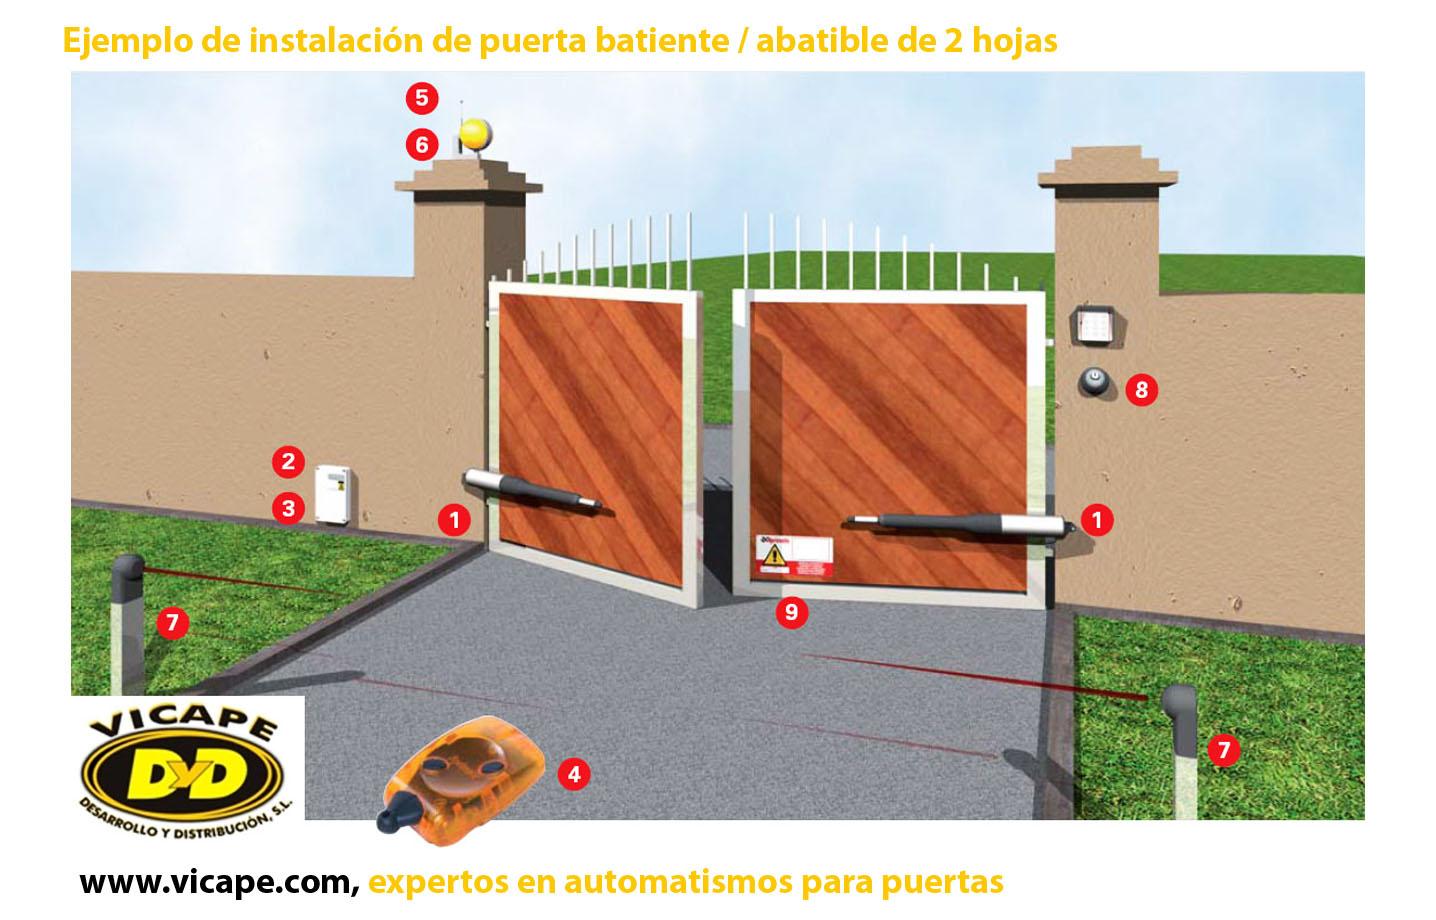 Puertas correderas autom ticas vicape com expertos en for Motor puerta automatica